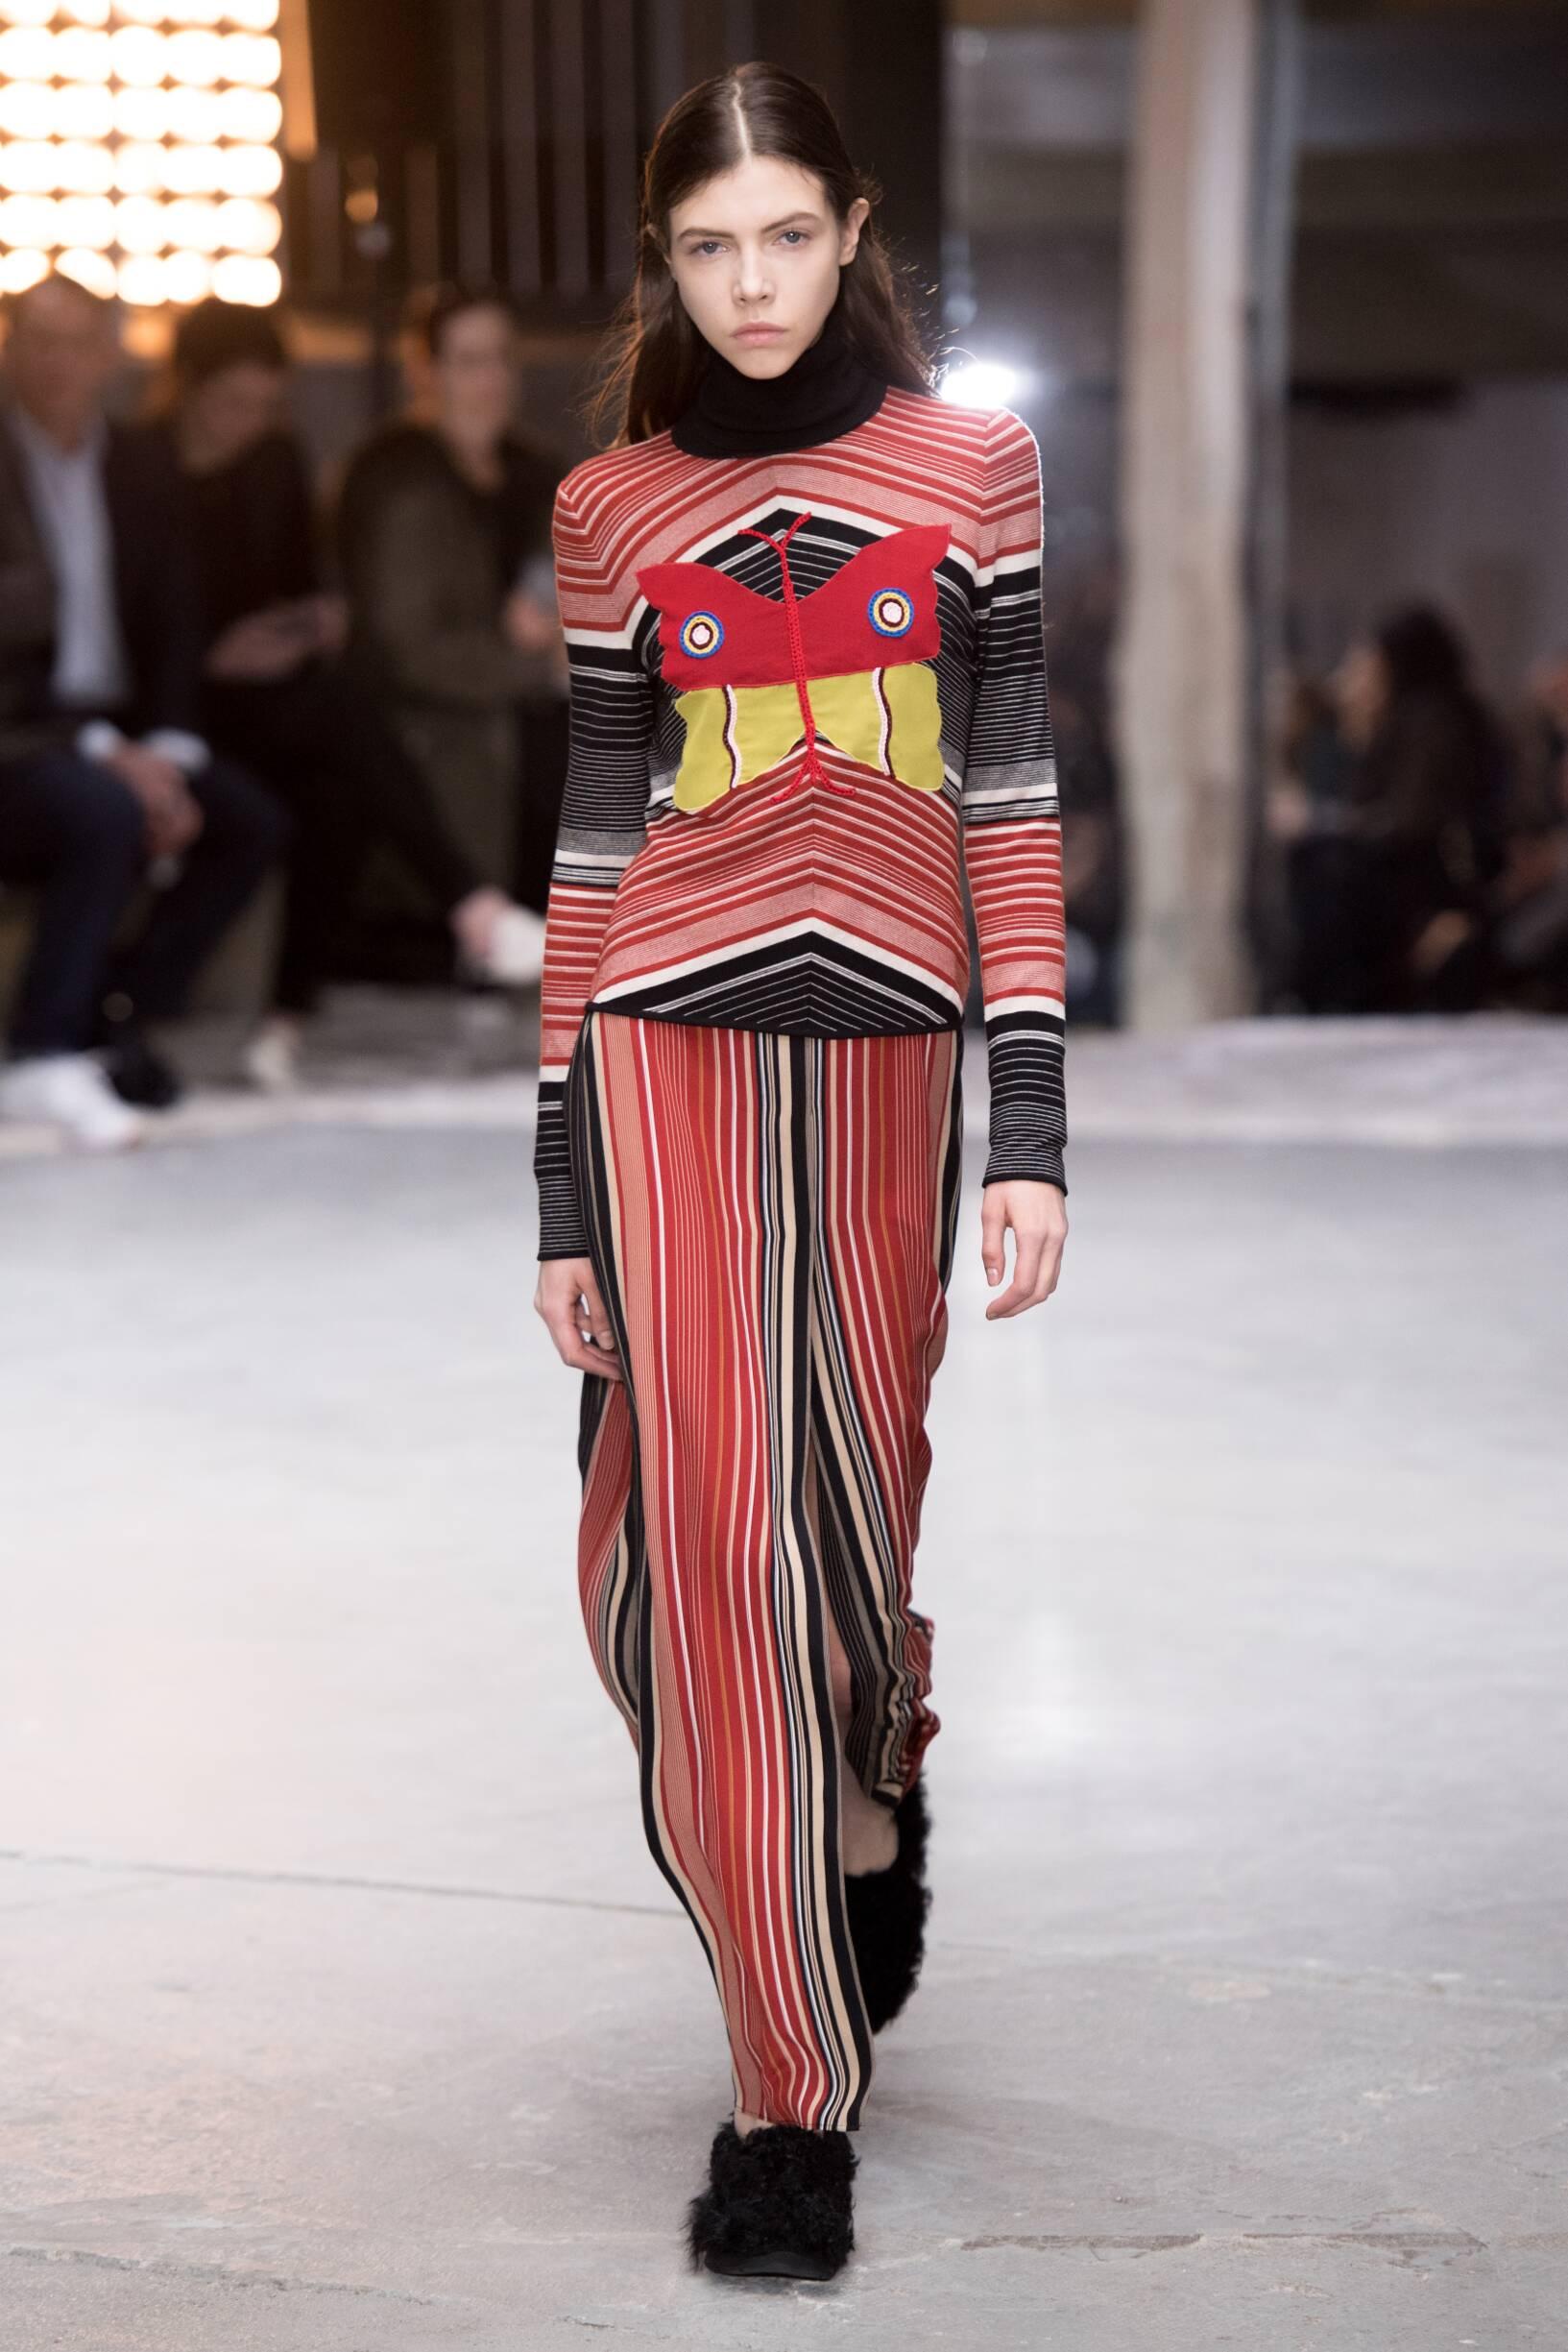 Fashion Woman Model Giambattista Valli Catwalk